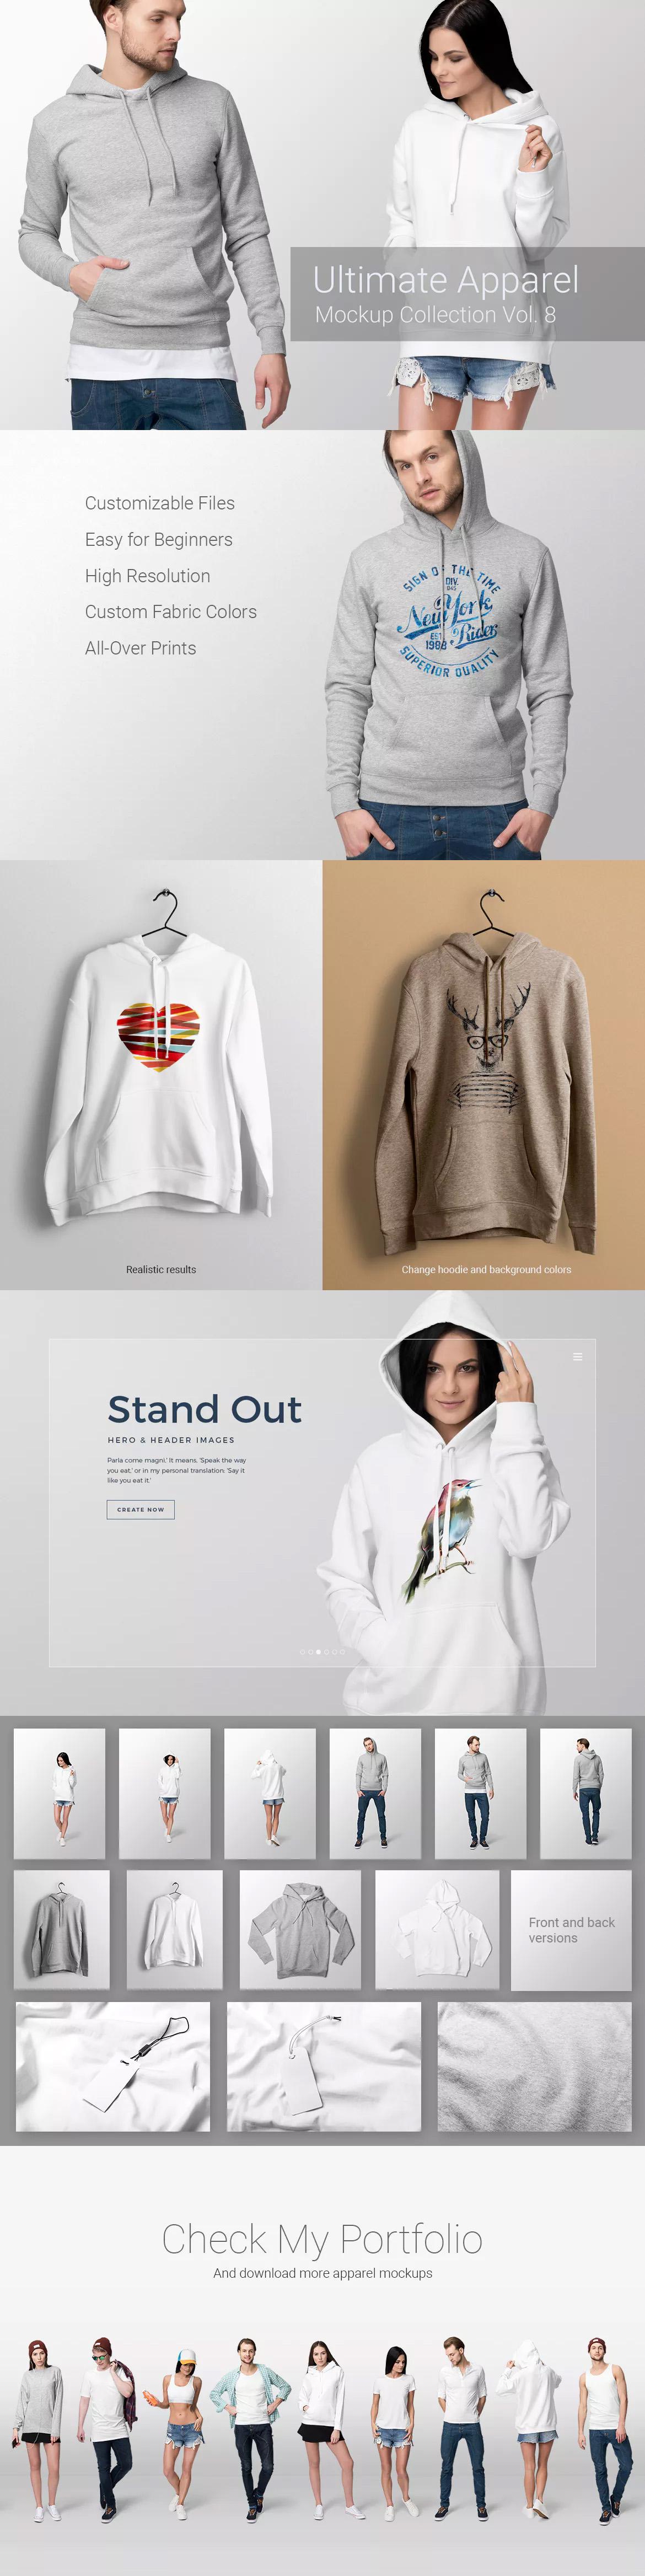 Download Ultimate Apparel Mockup Vol 8 By Genetic96 On Envato Elements Clothing Mockup Apparel Mockup